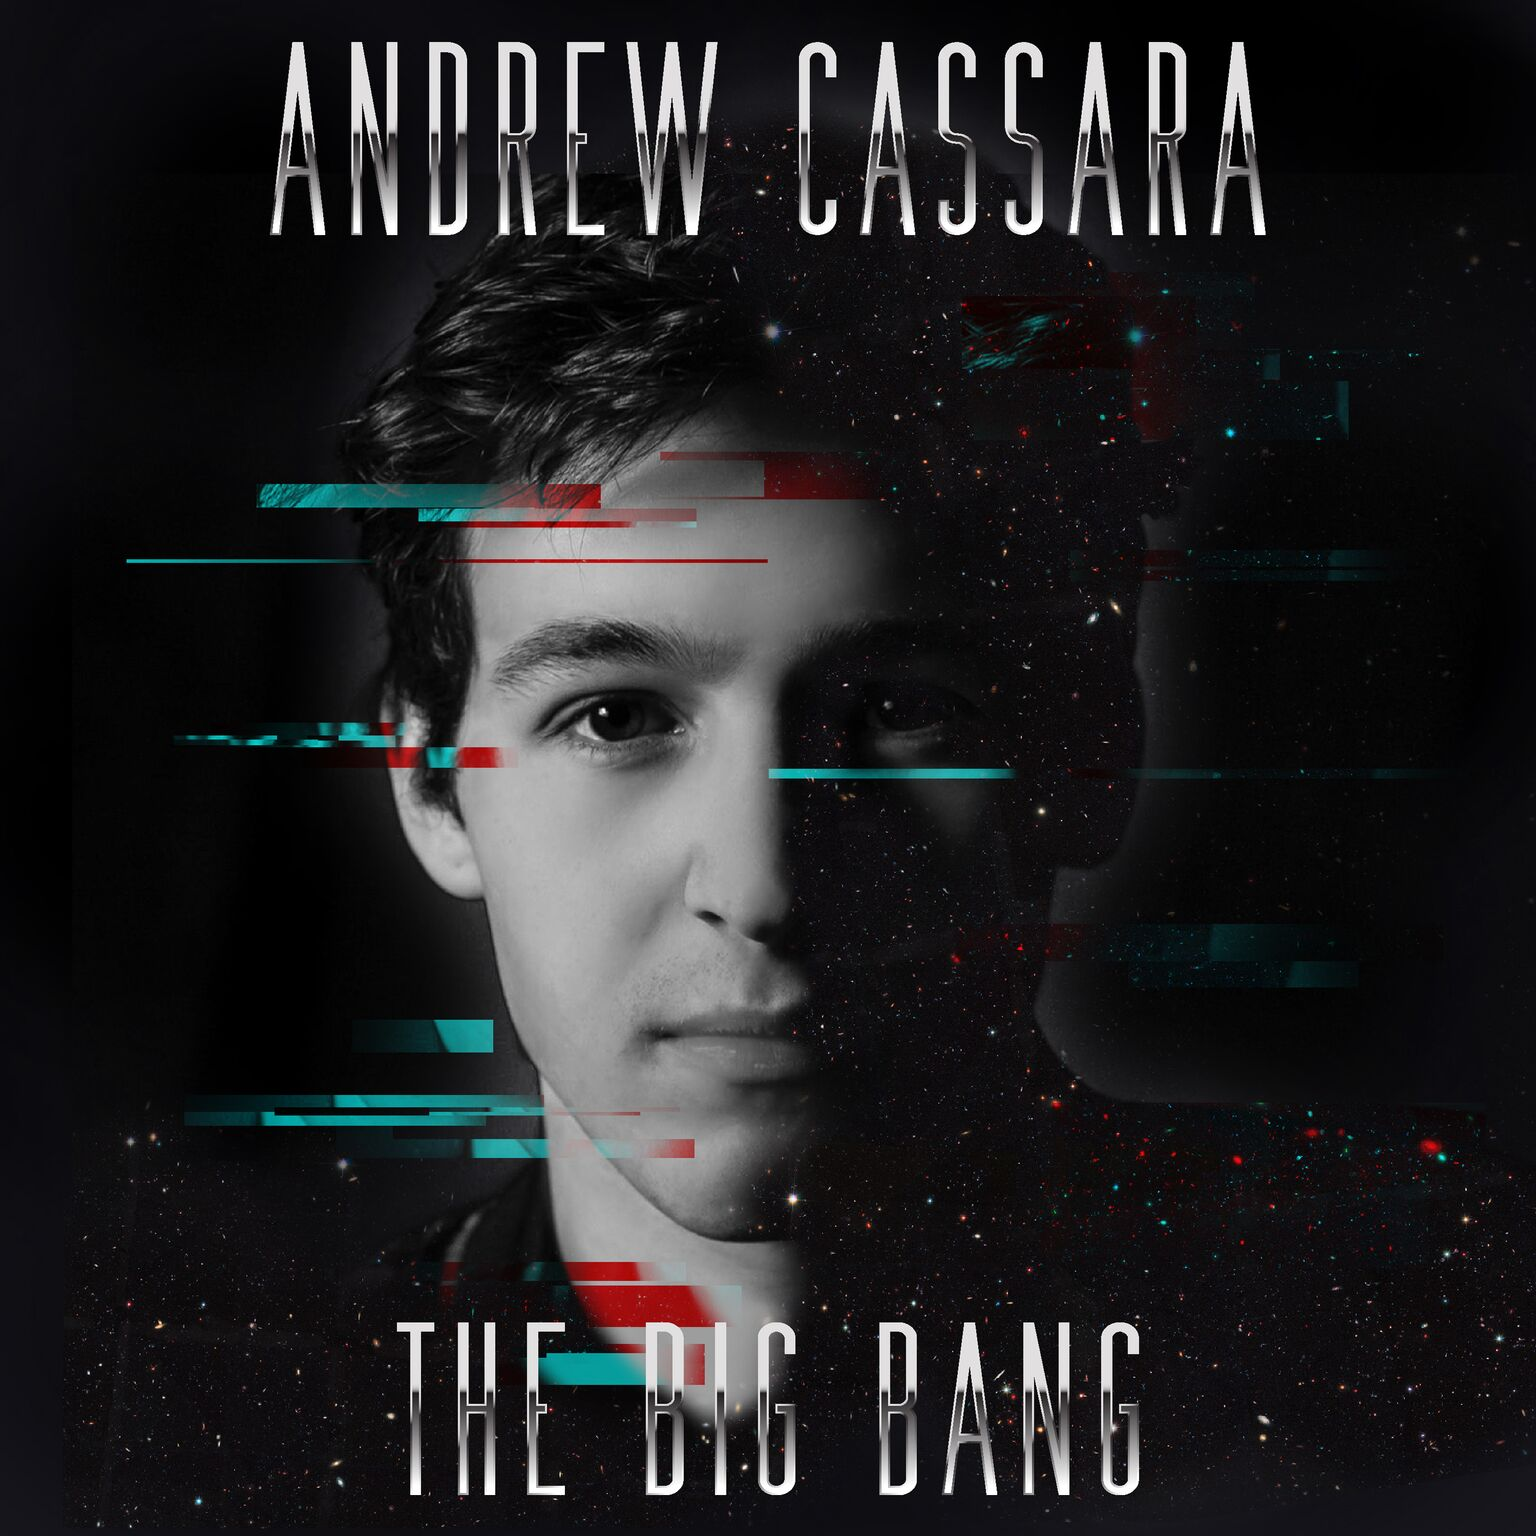 The Big Bang - Andrew Cassara Image